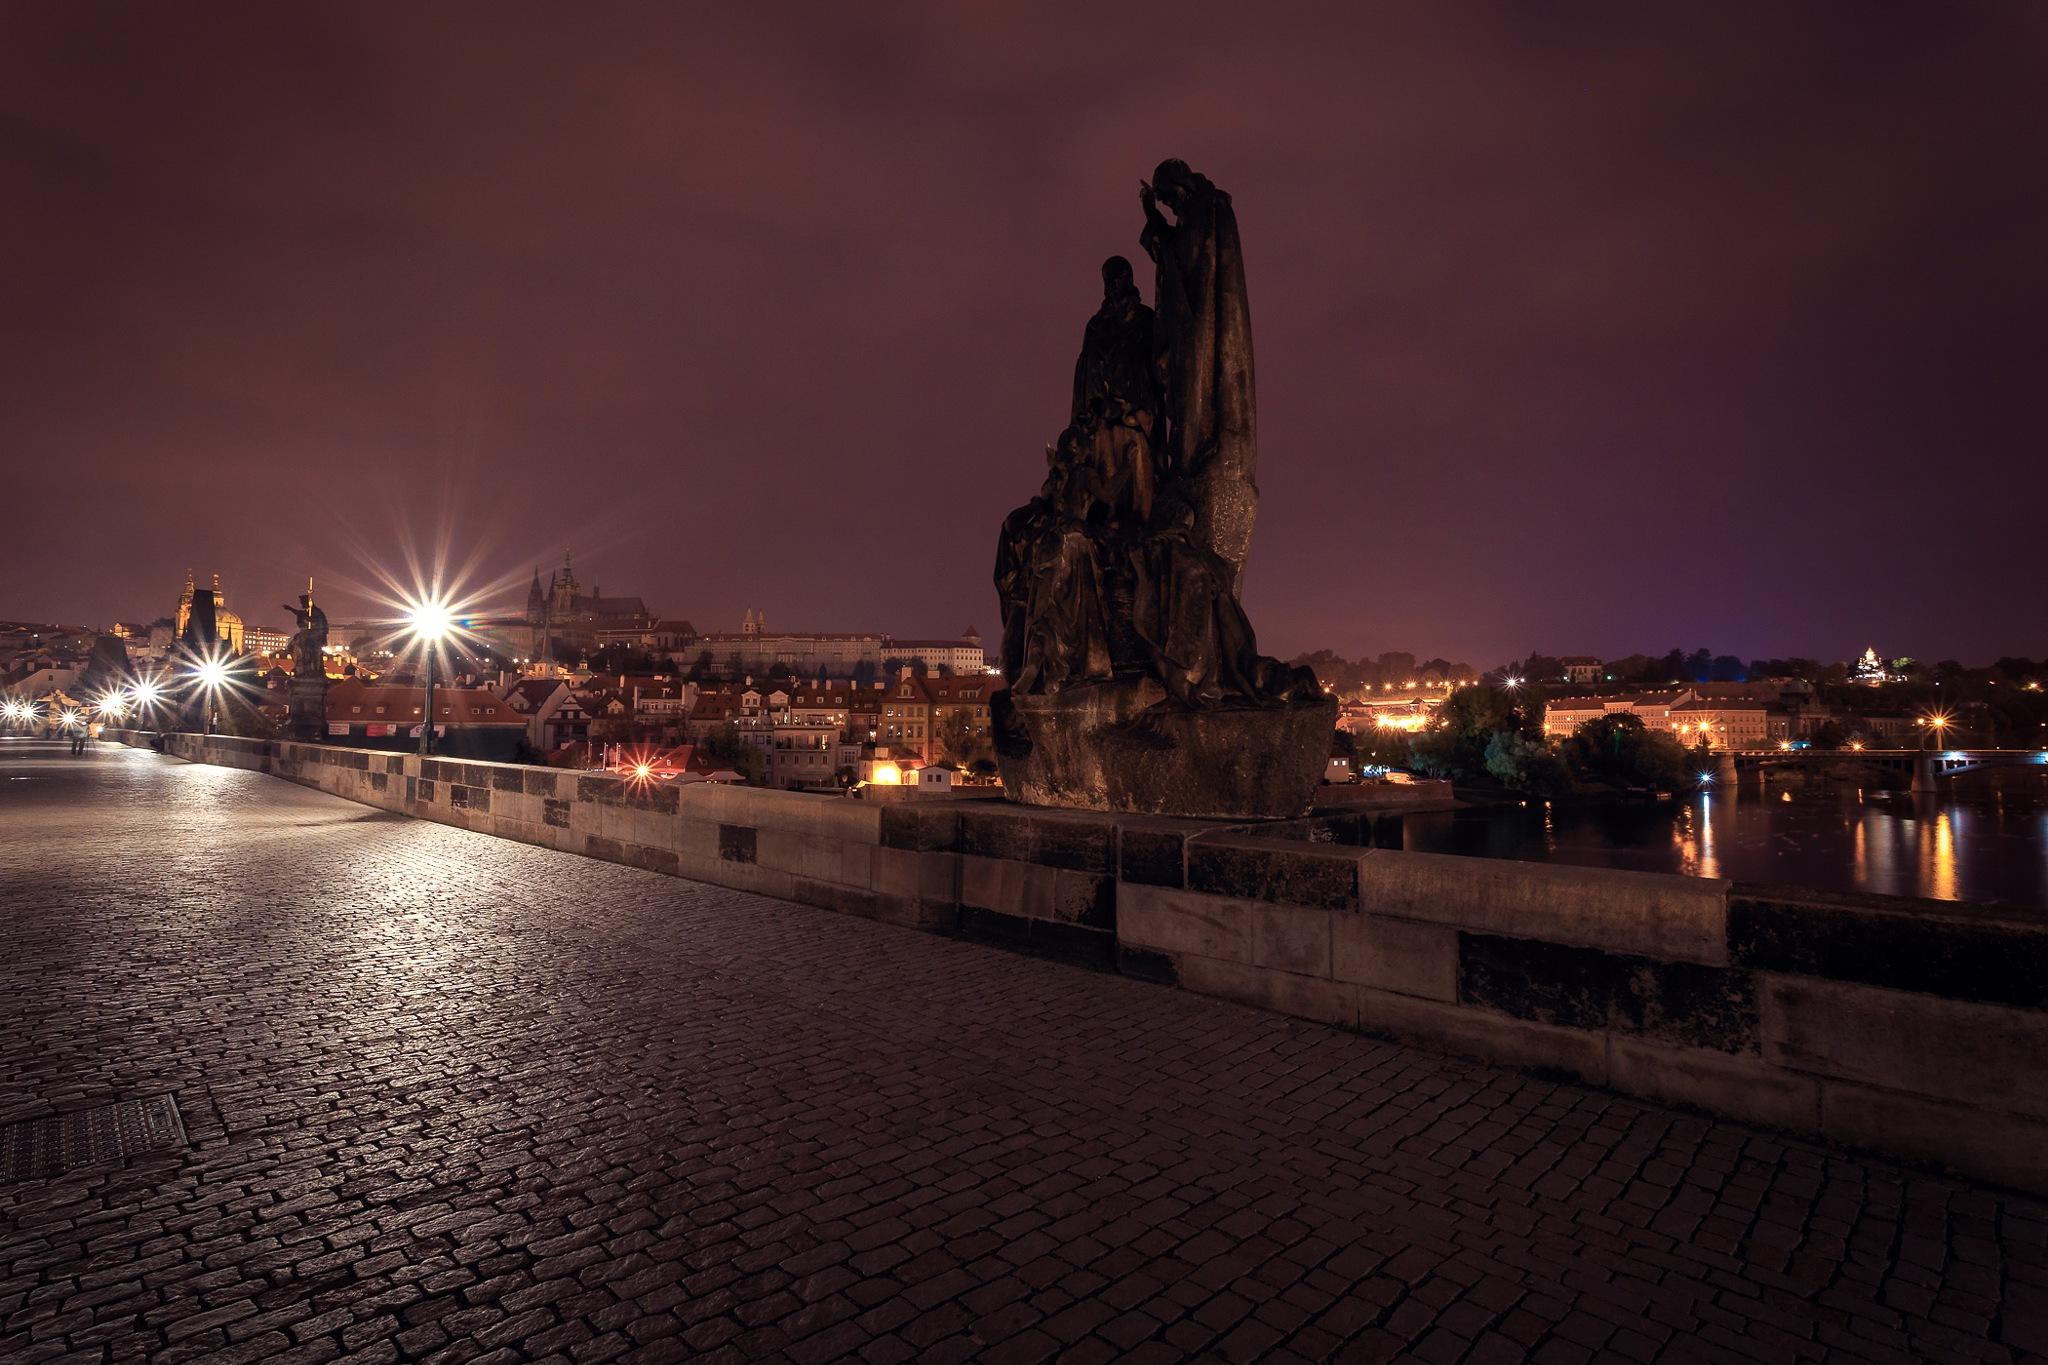 figure on Charles bridge by vladimirz